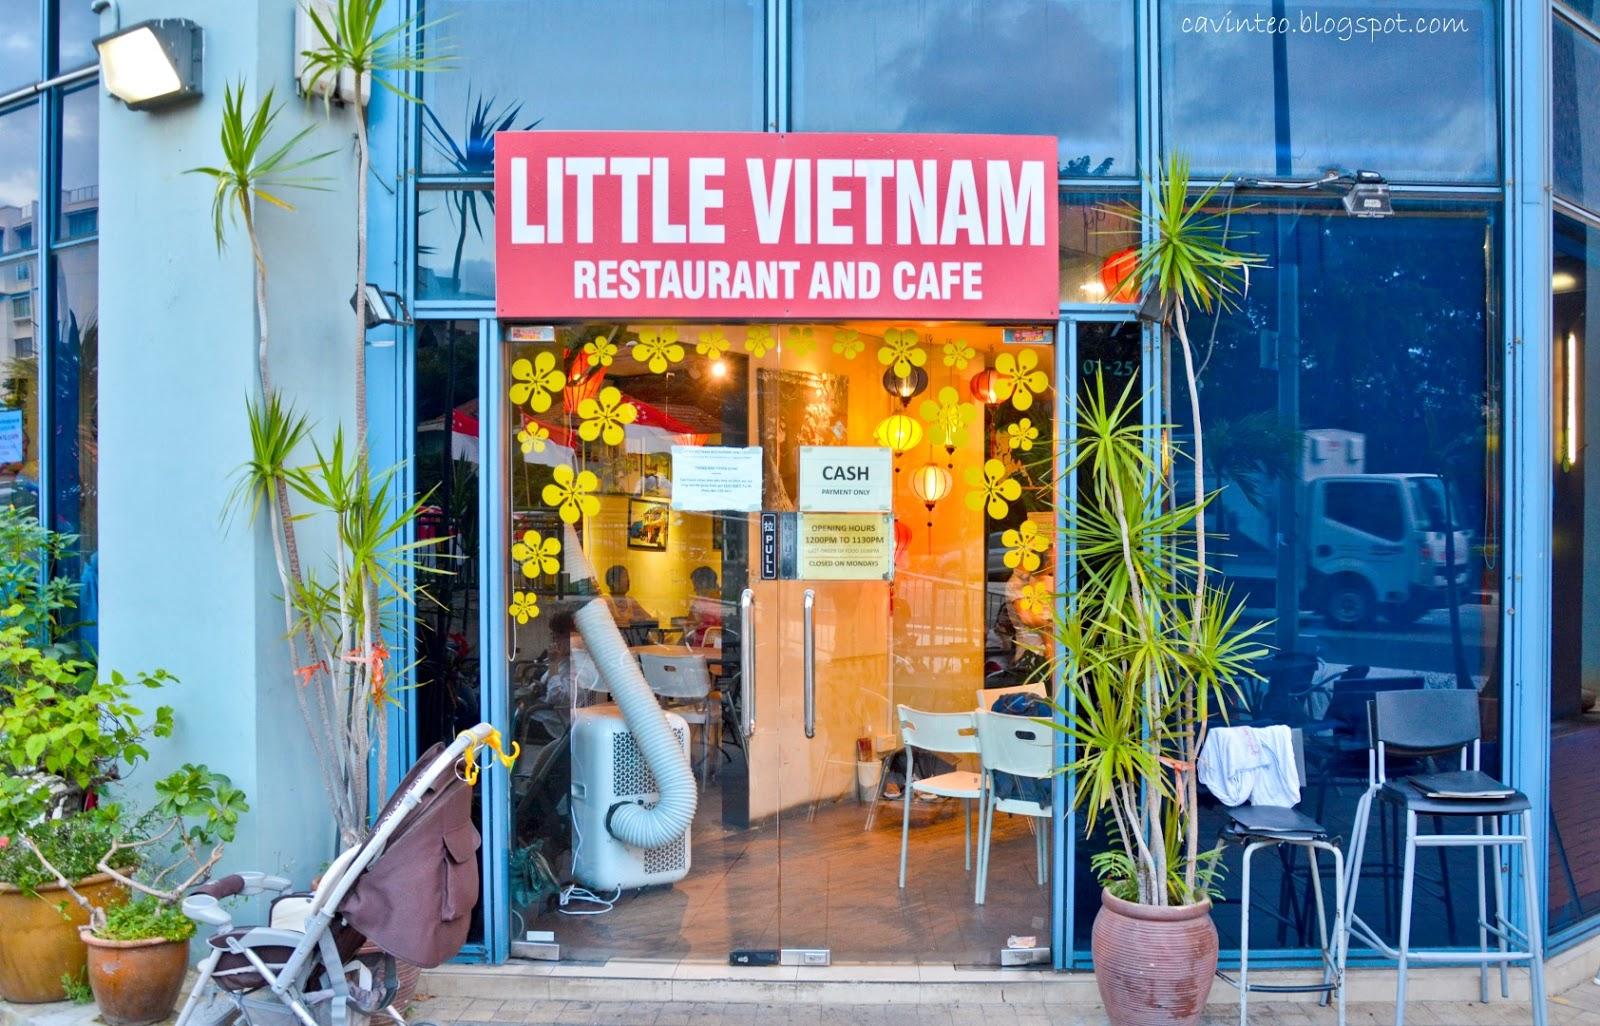 Entree Kibbles Little Vietnam Restaurant And Cafe